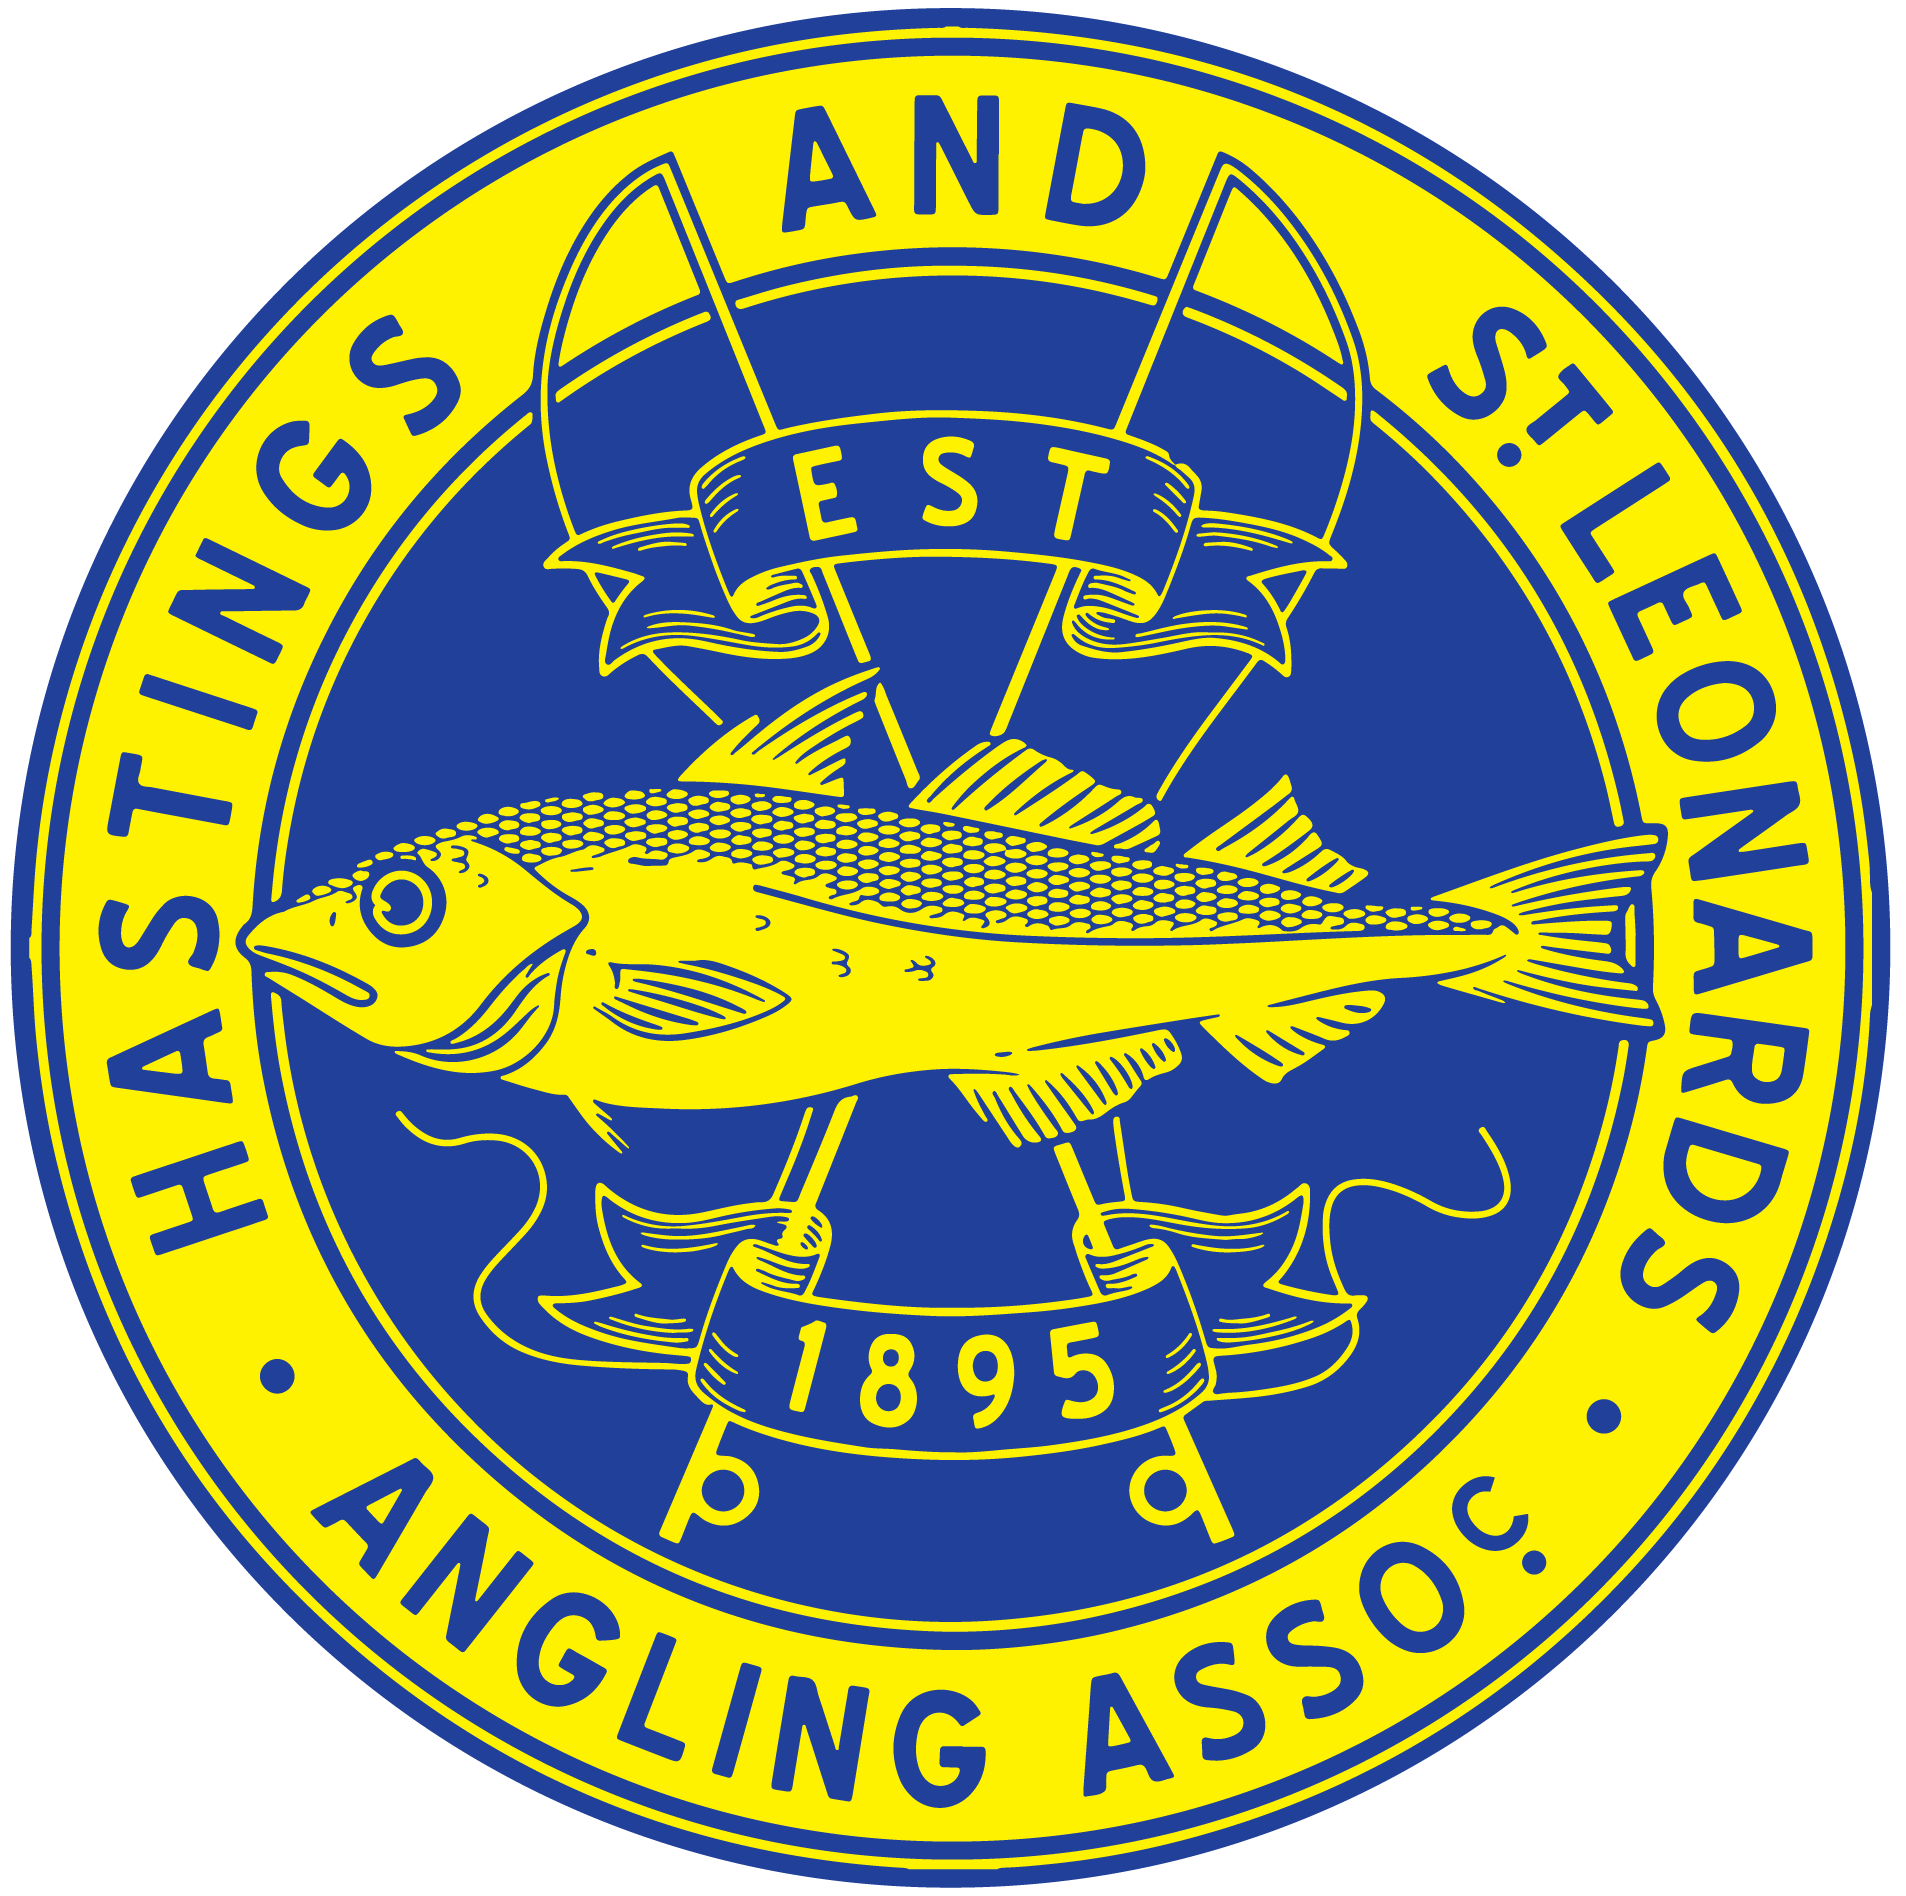 Hastings & St. Leonards Angling Association